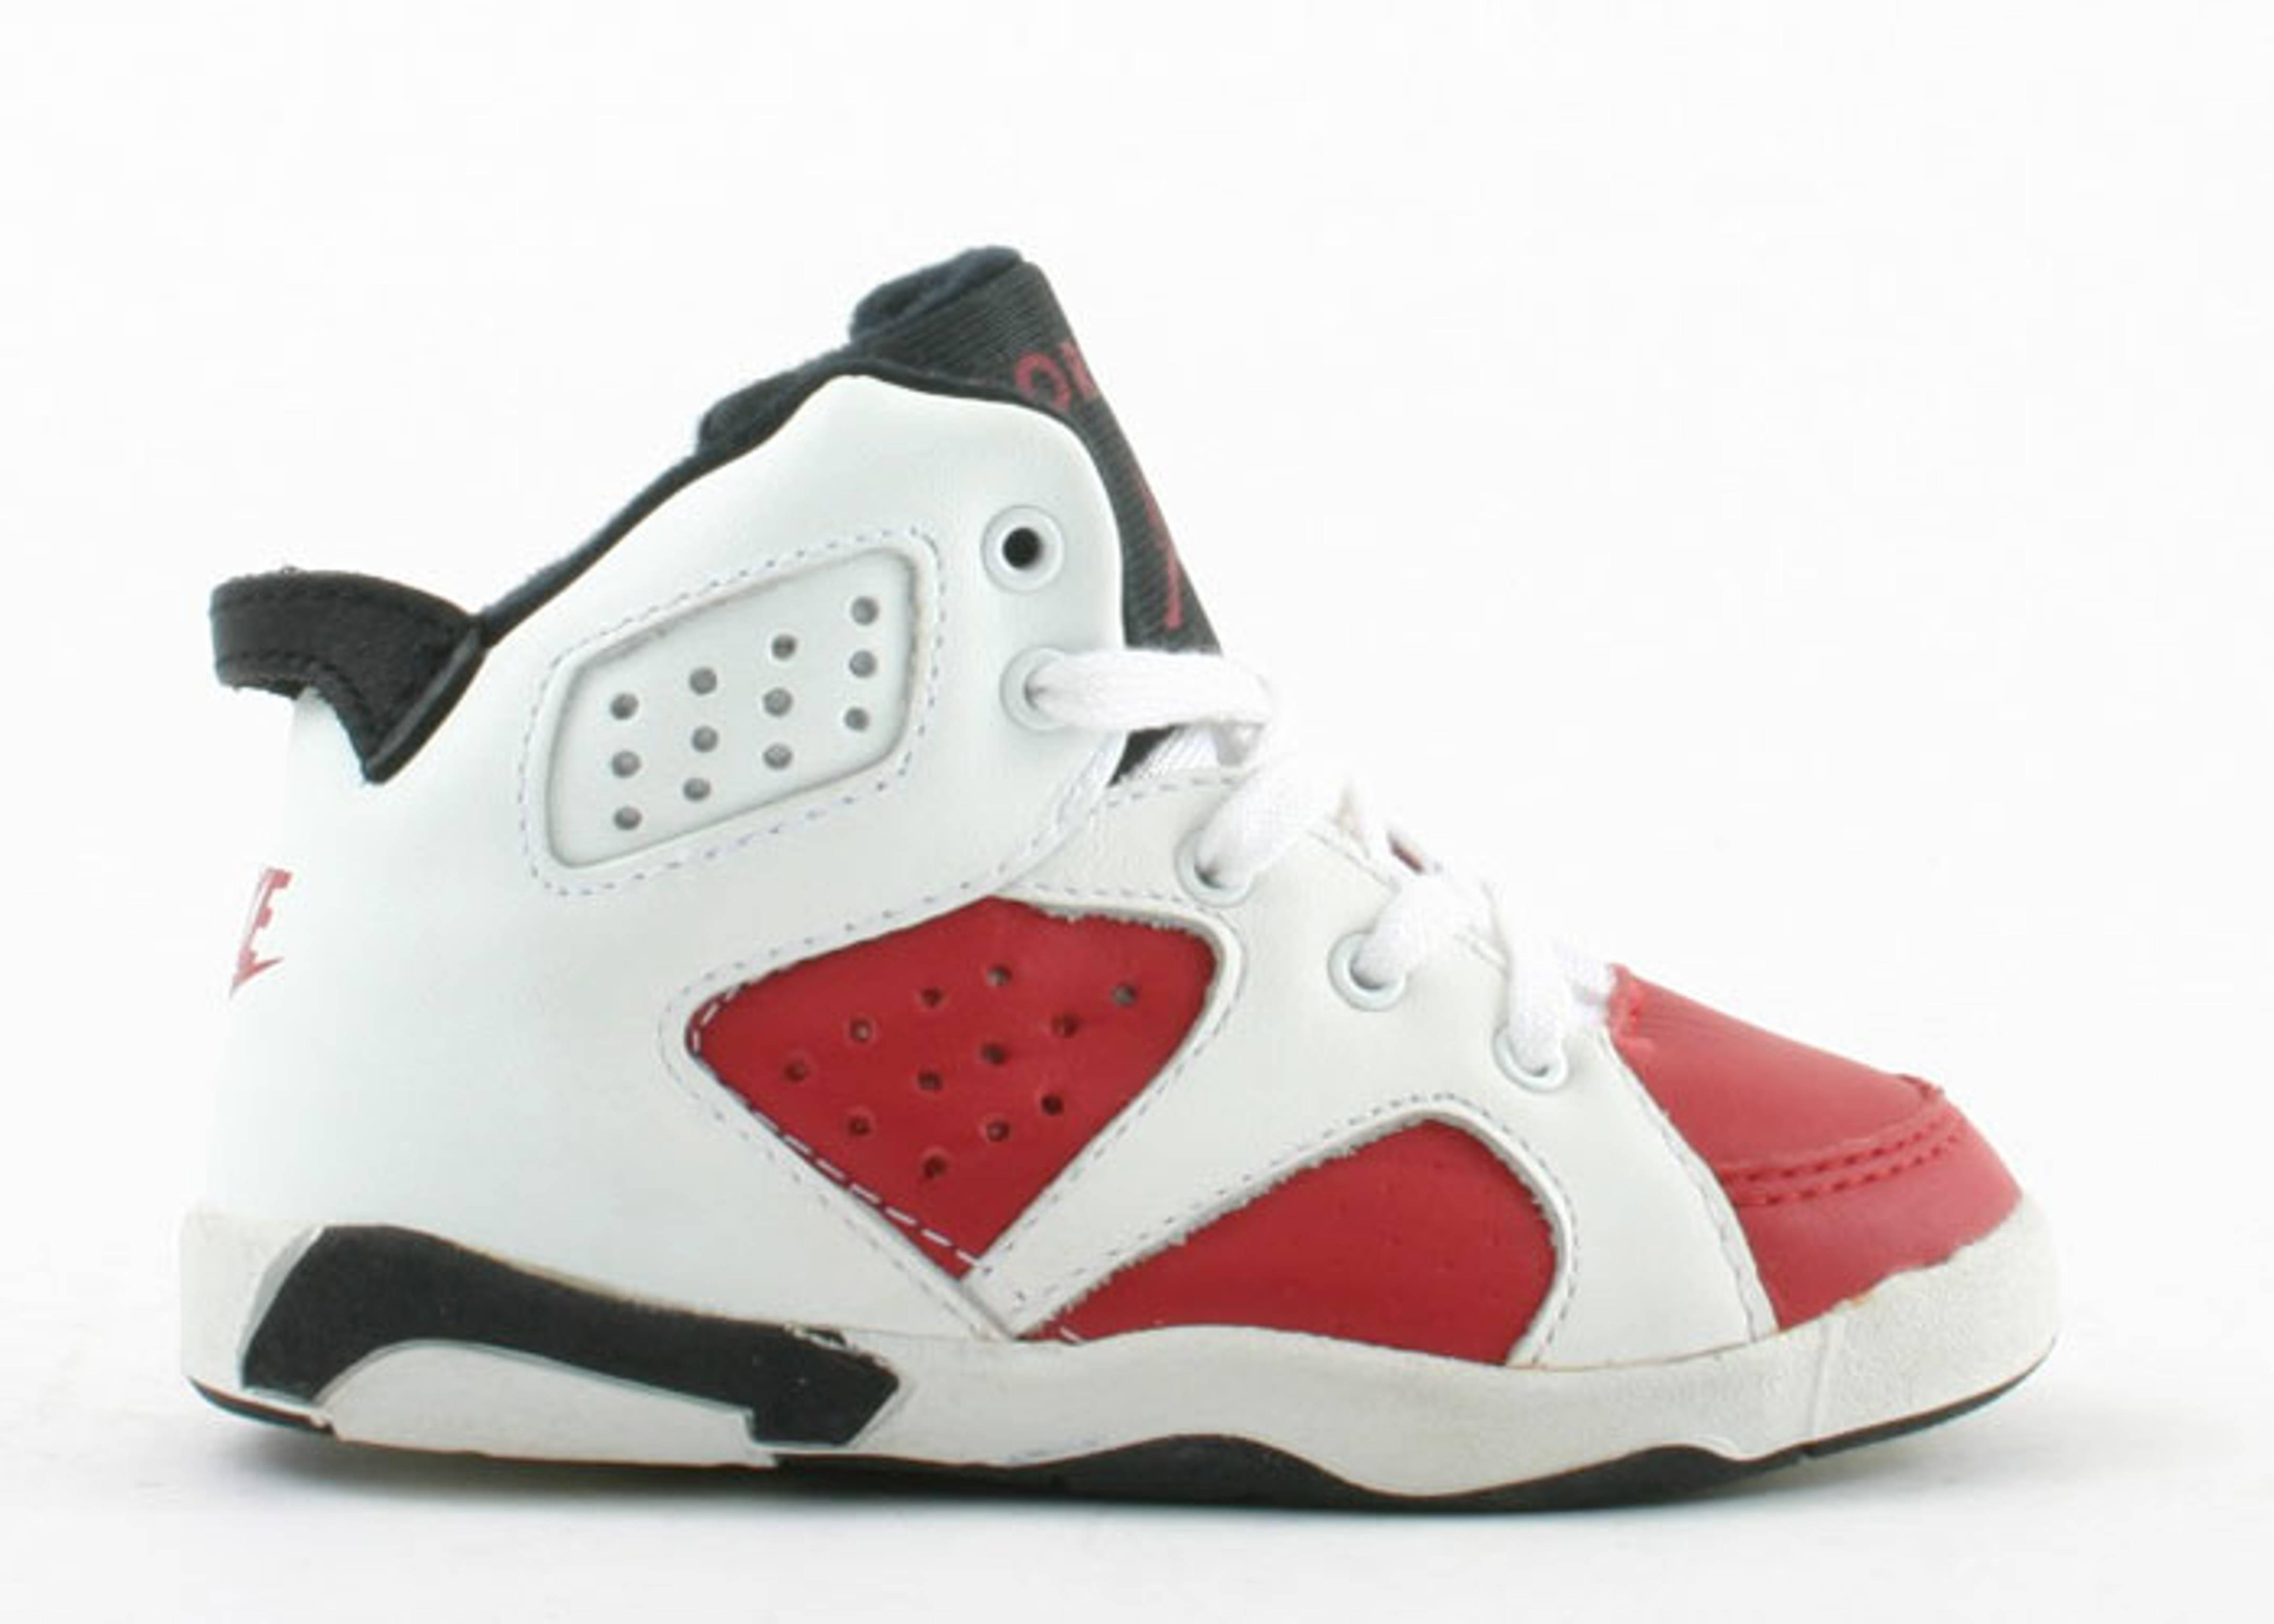 d6c84ebdd5a Baby Jordan 6 - Air Jordan - 7729 - white/carmine/black | Flight Club